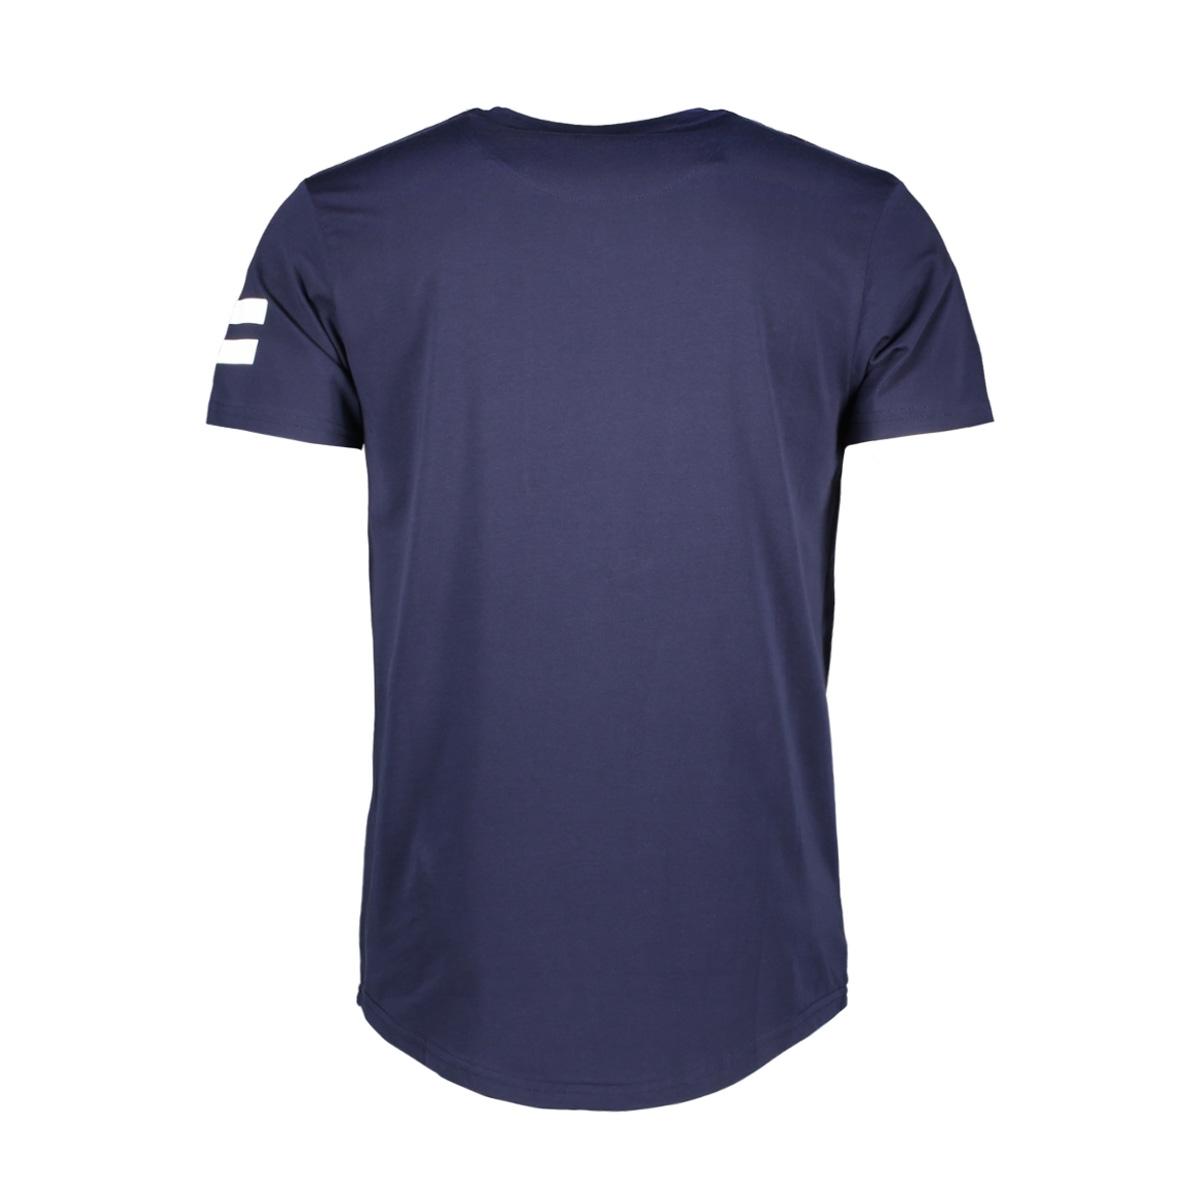 13861 gabbiano t-shirt navy